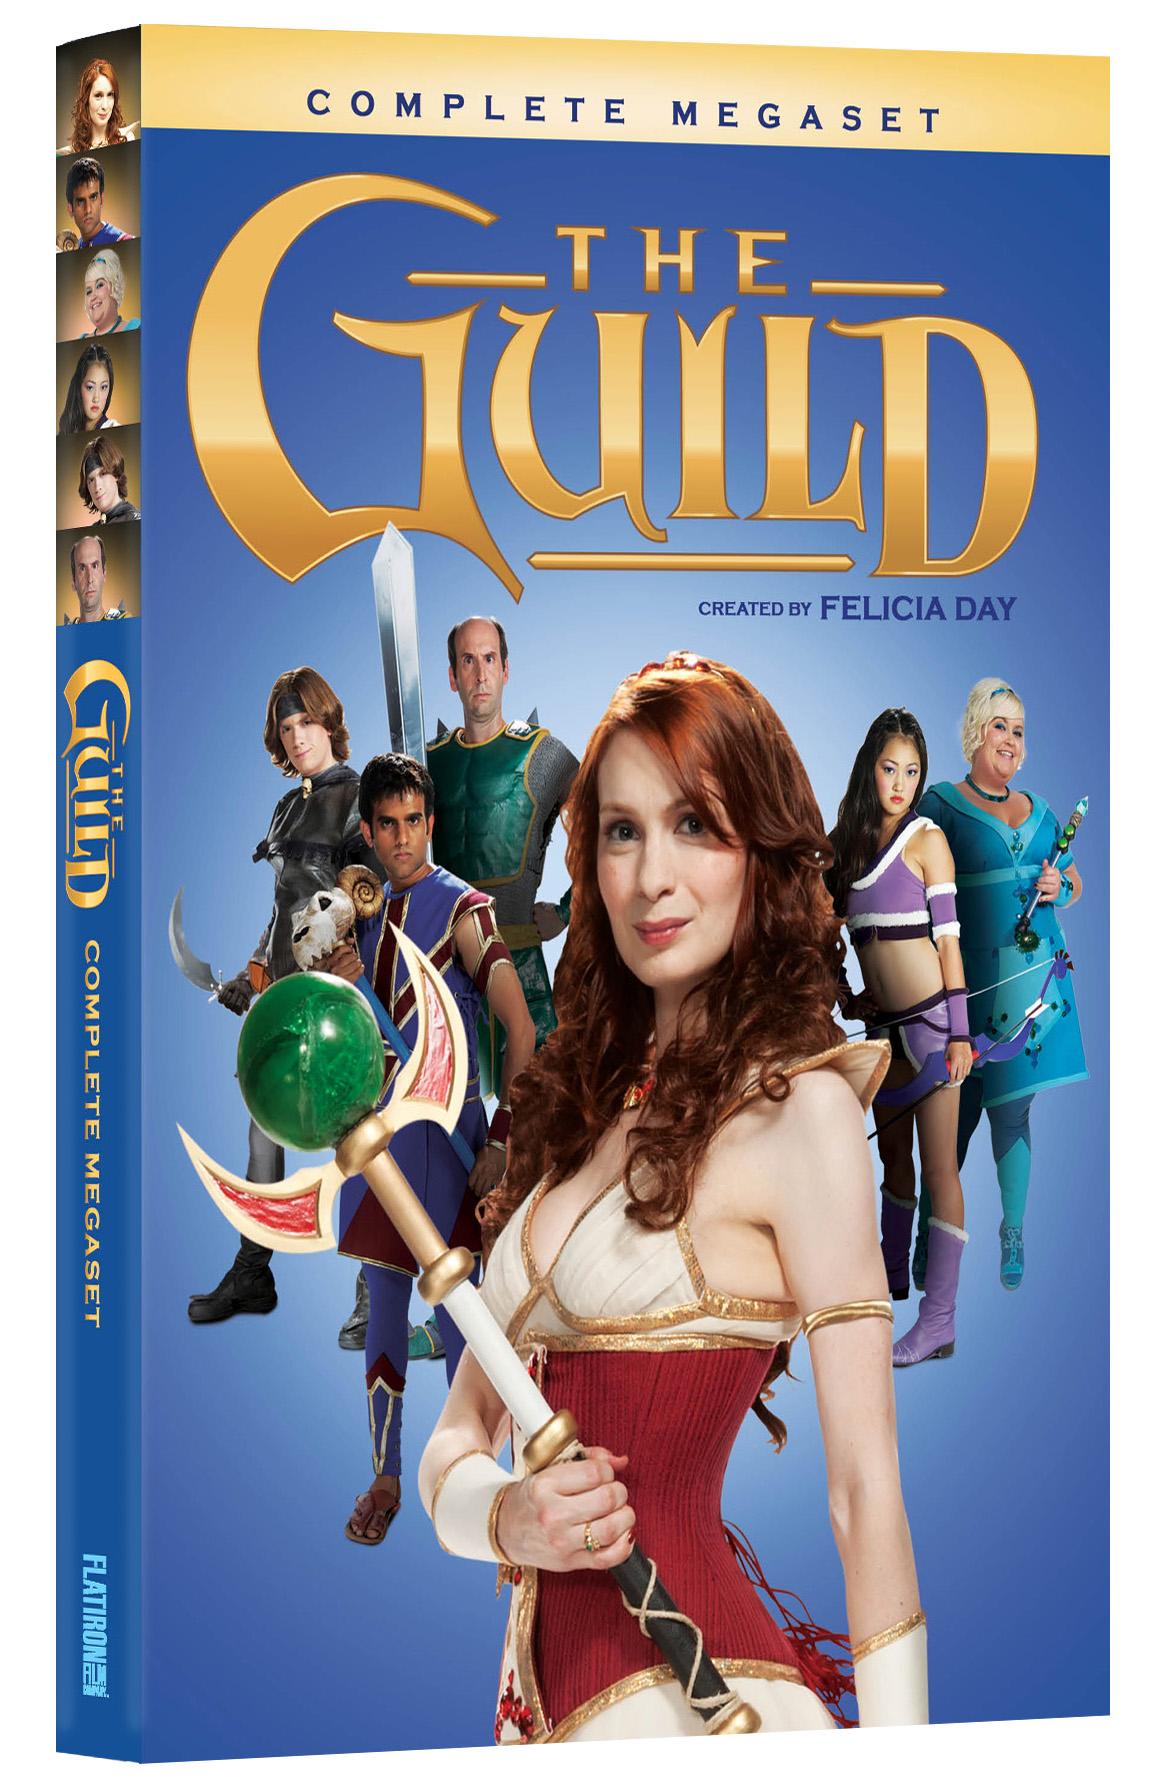 The Guild Complete Megaset DVD Review